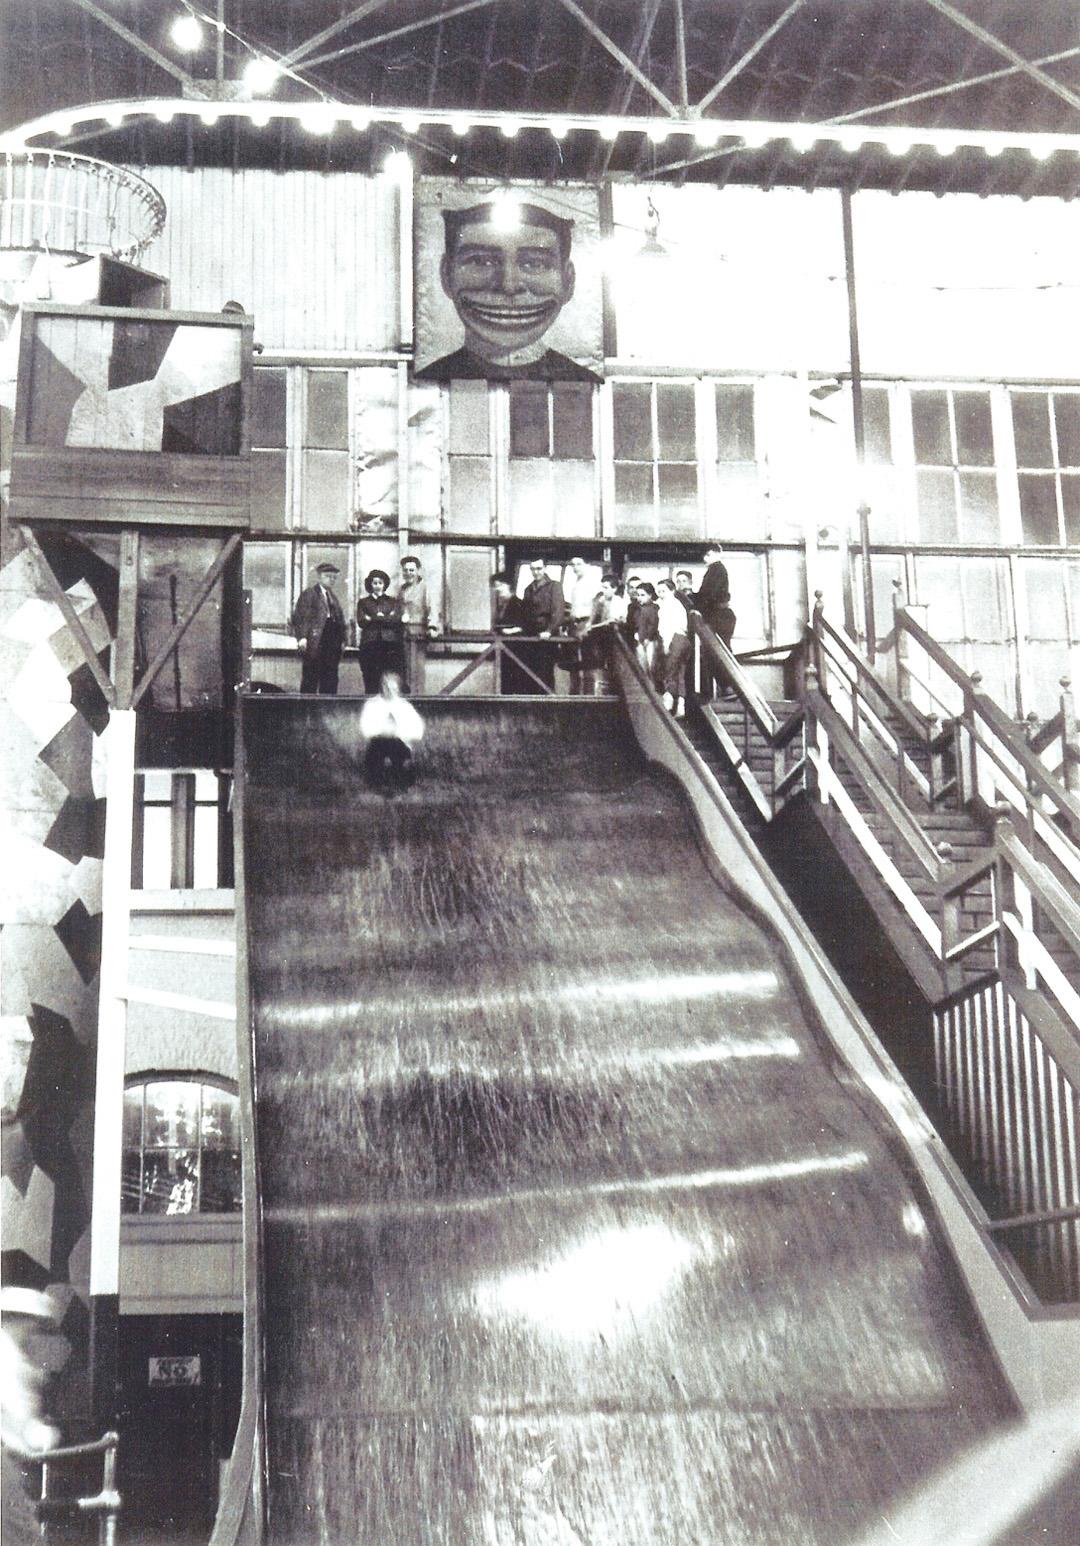 Panama-slide-Steeplechase-park-coney-island-ca-1930